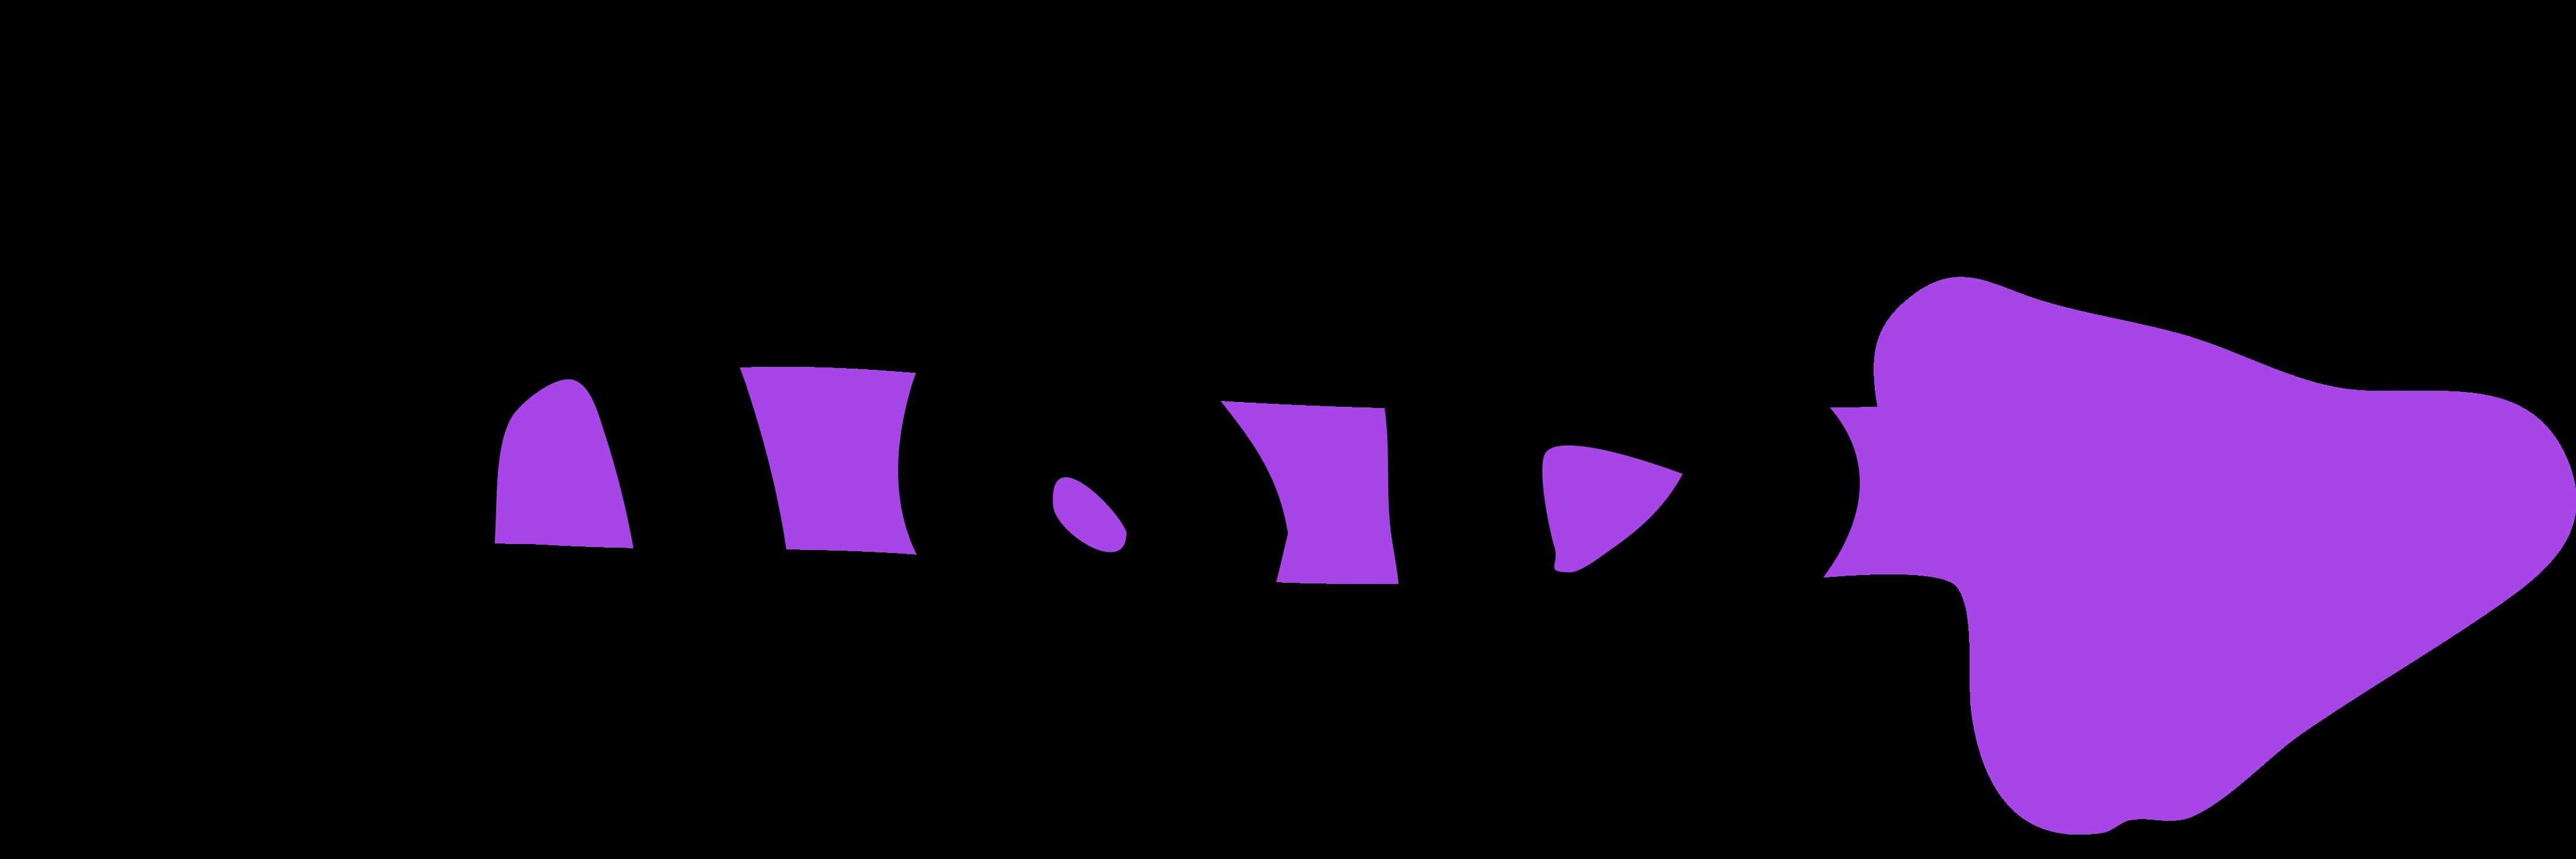 mob-sh banner